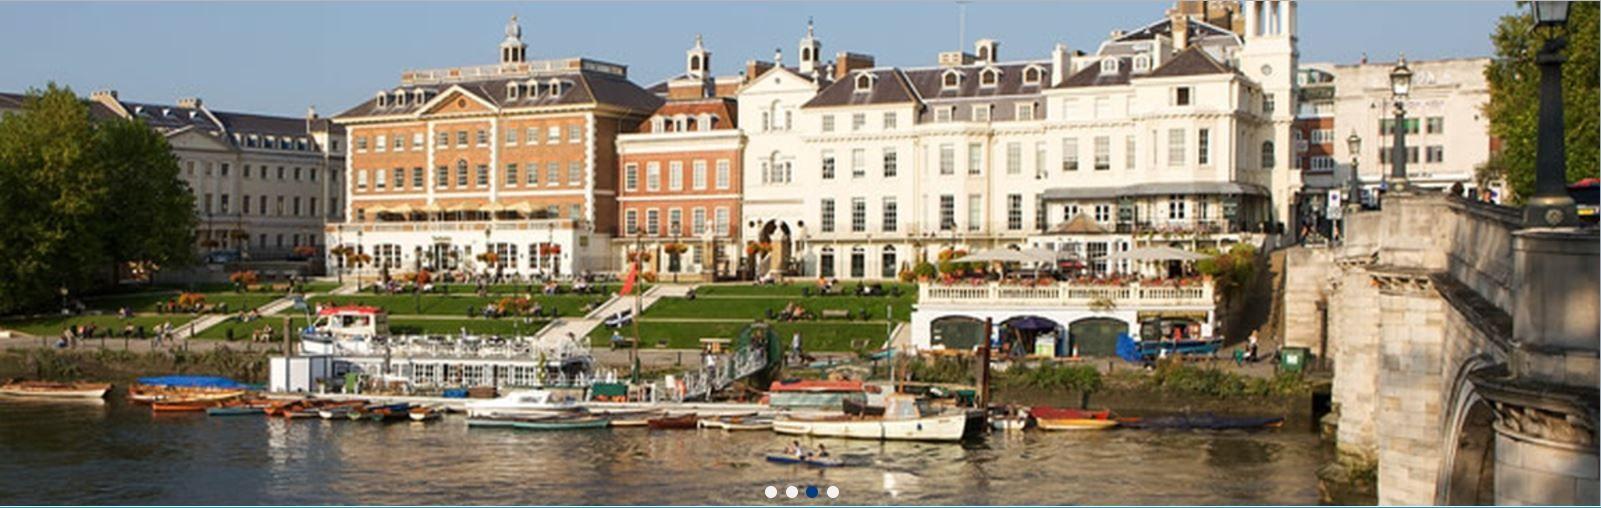 a55d7563e35d44b64a1bb69fe11fb52c - Thames River Boat To Kew Gardens